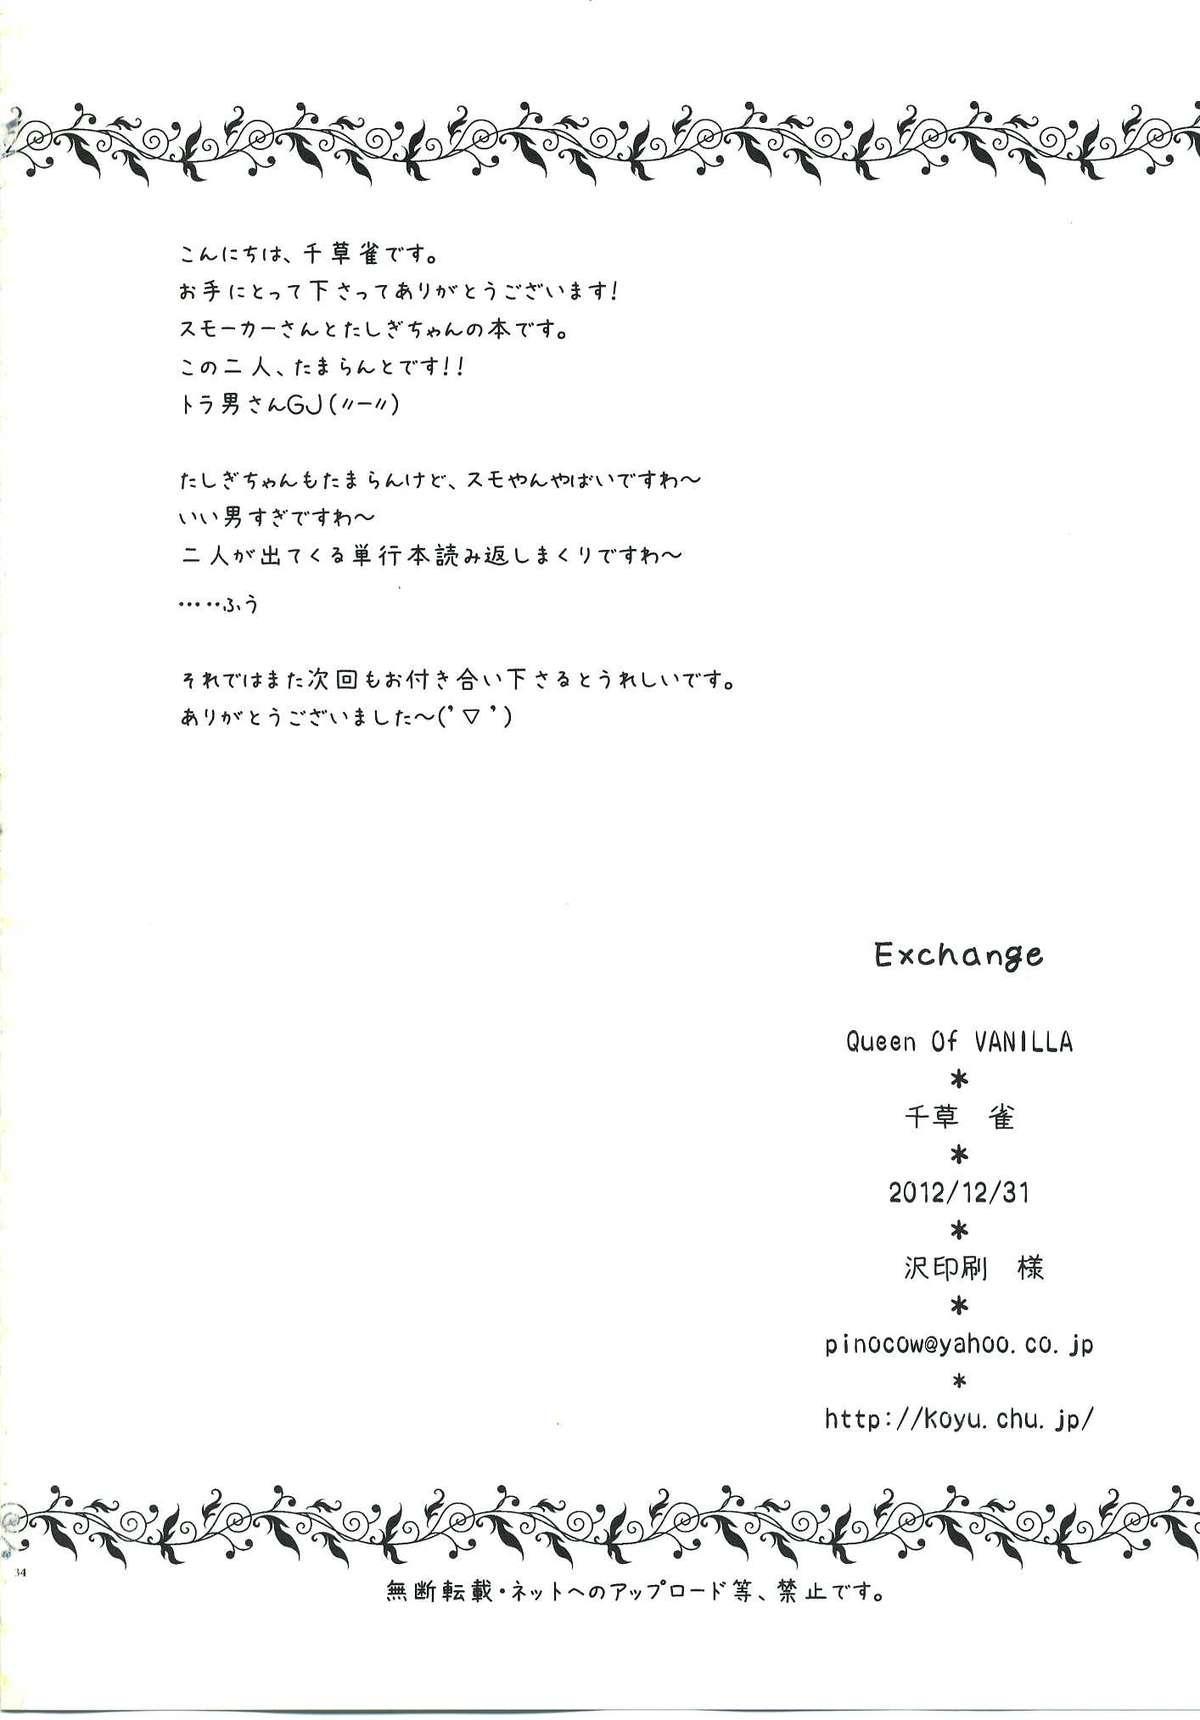 Exchange 28